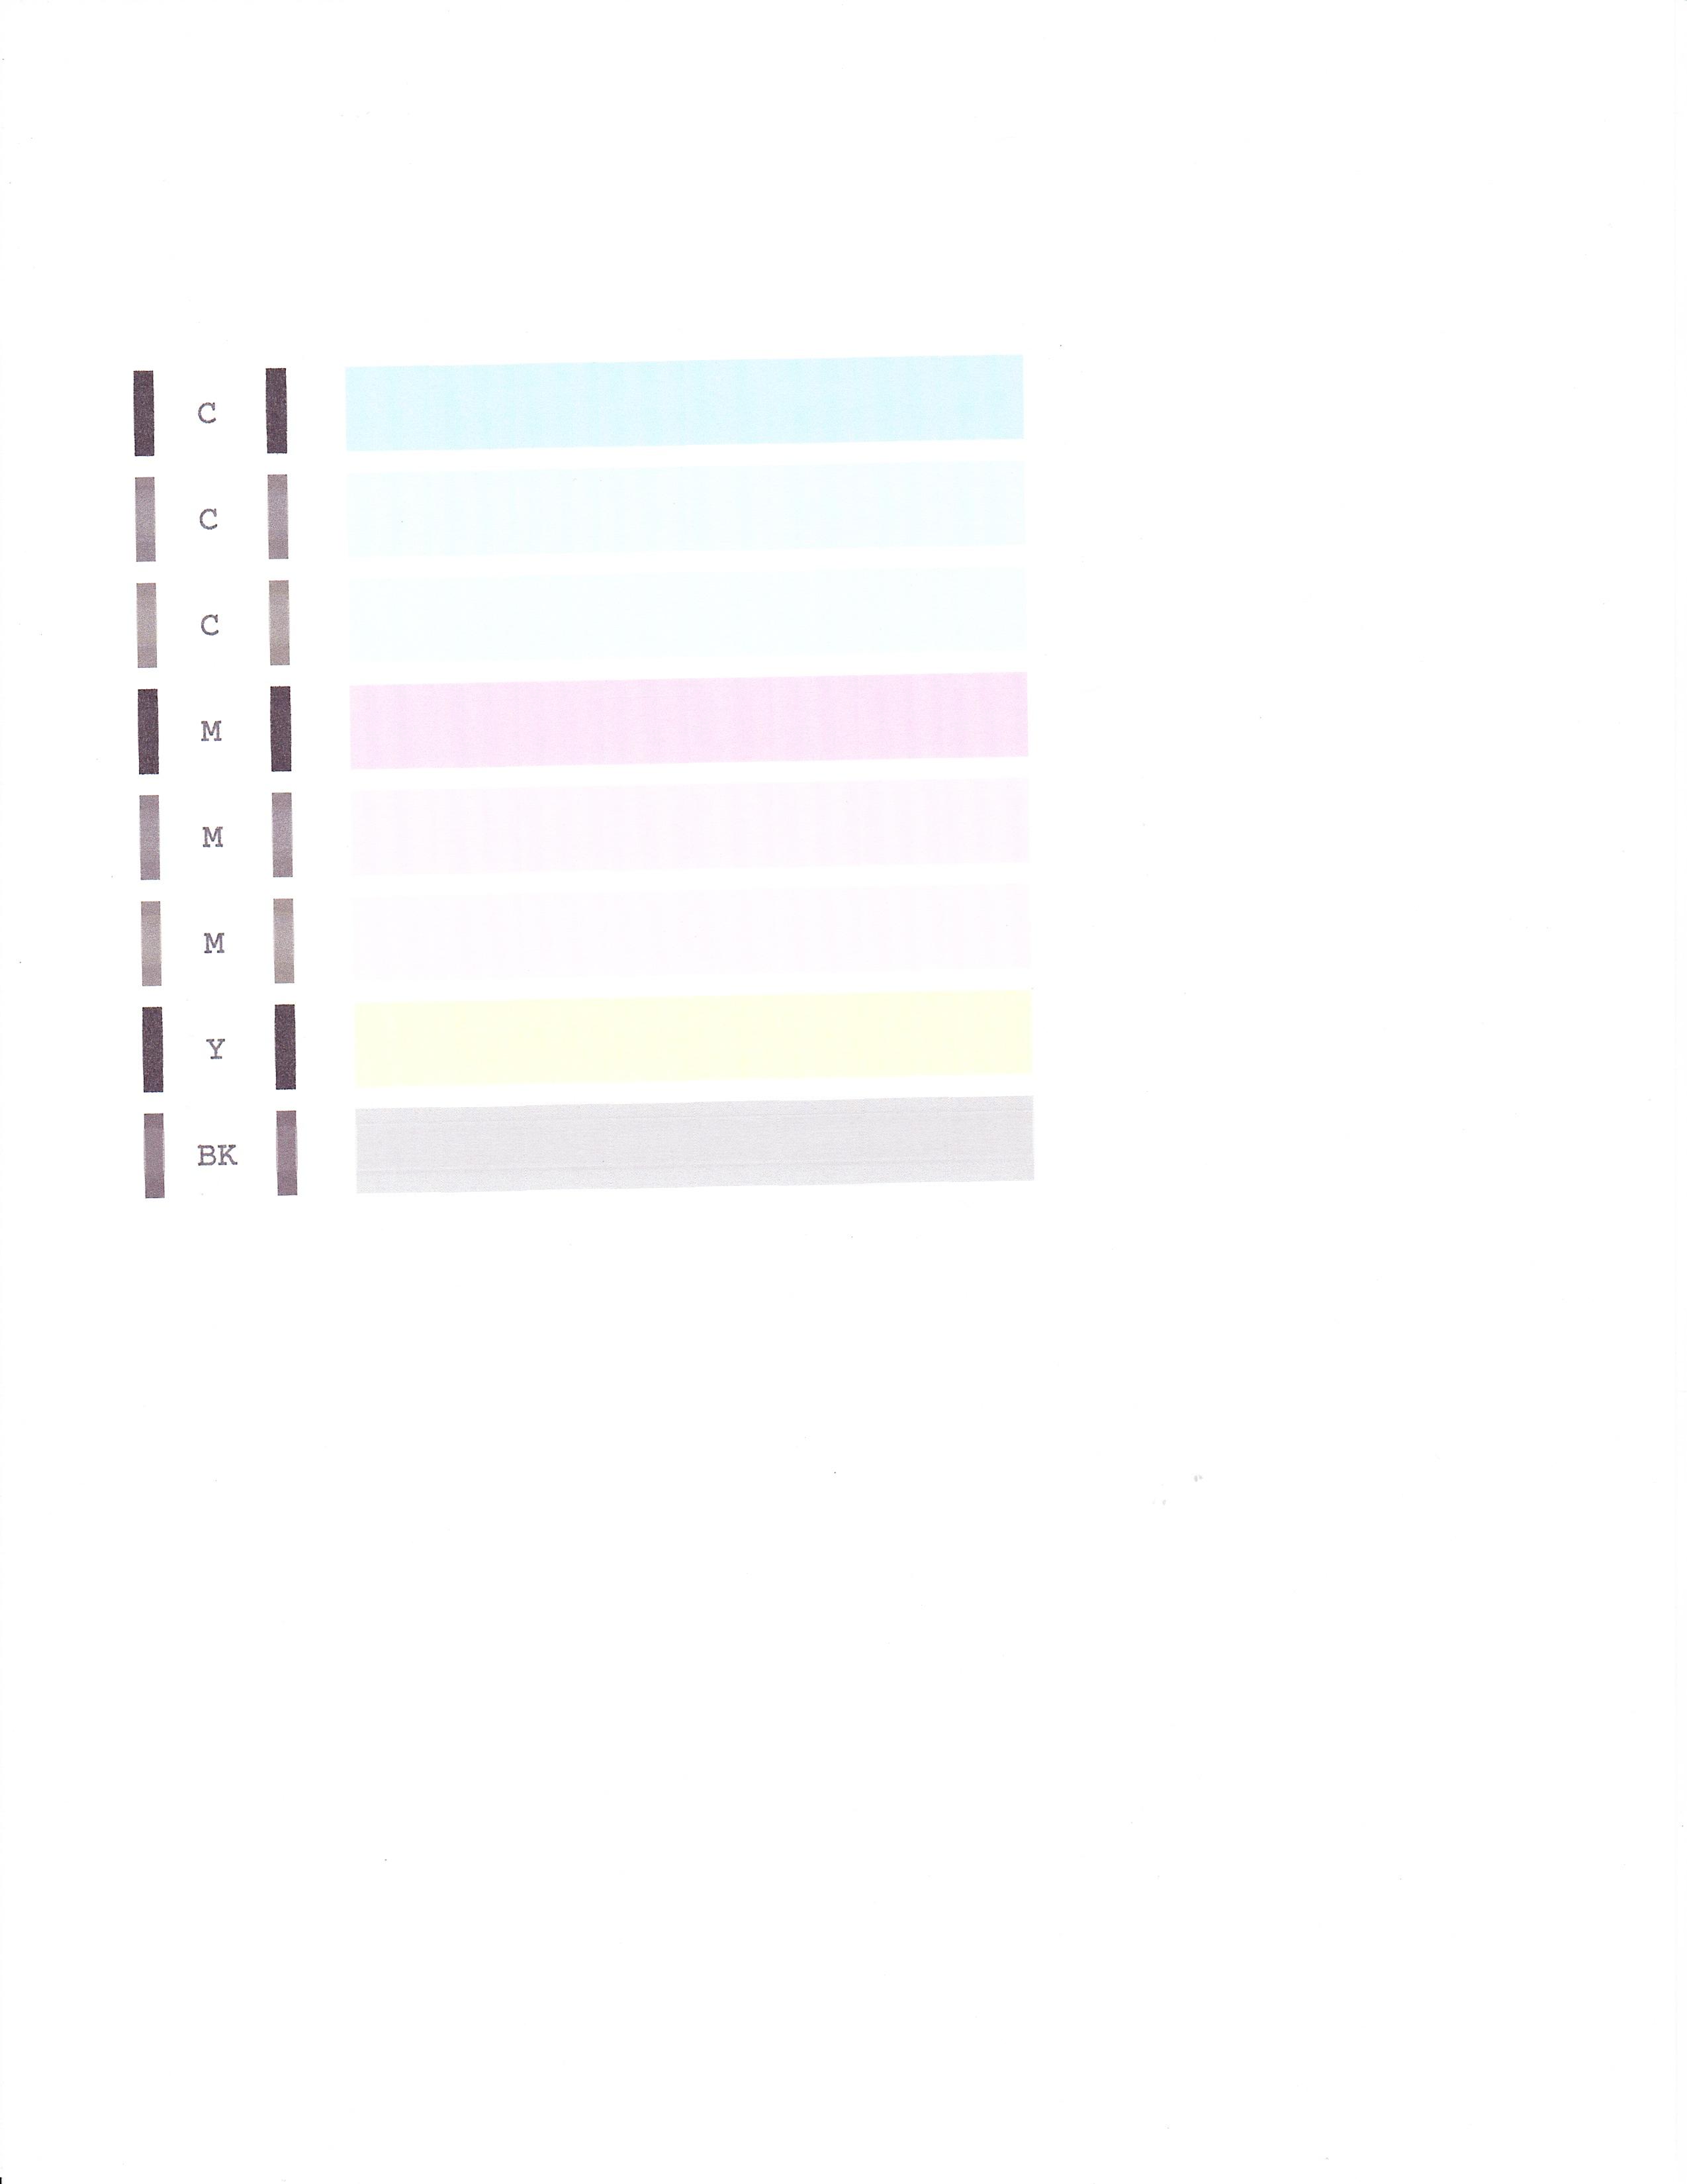 Print nozzle check pattern_0001.jpg